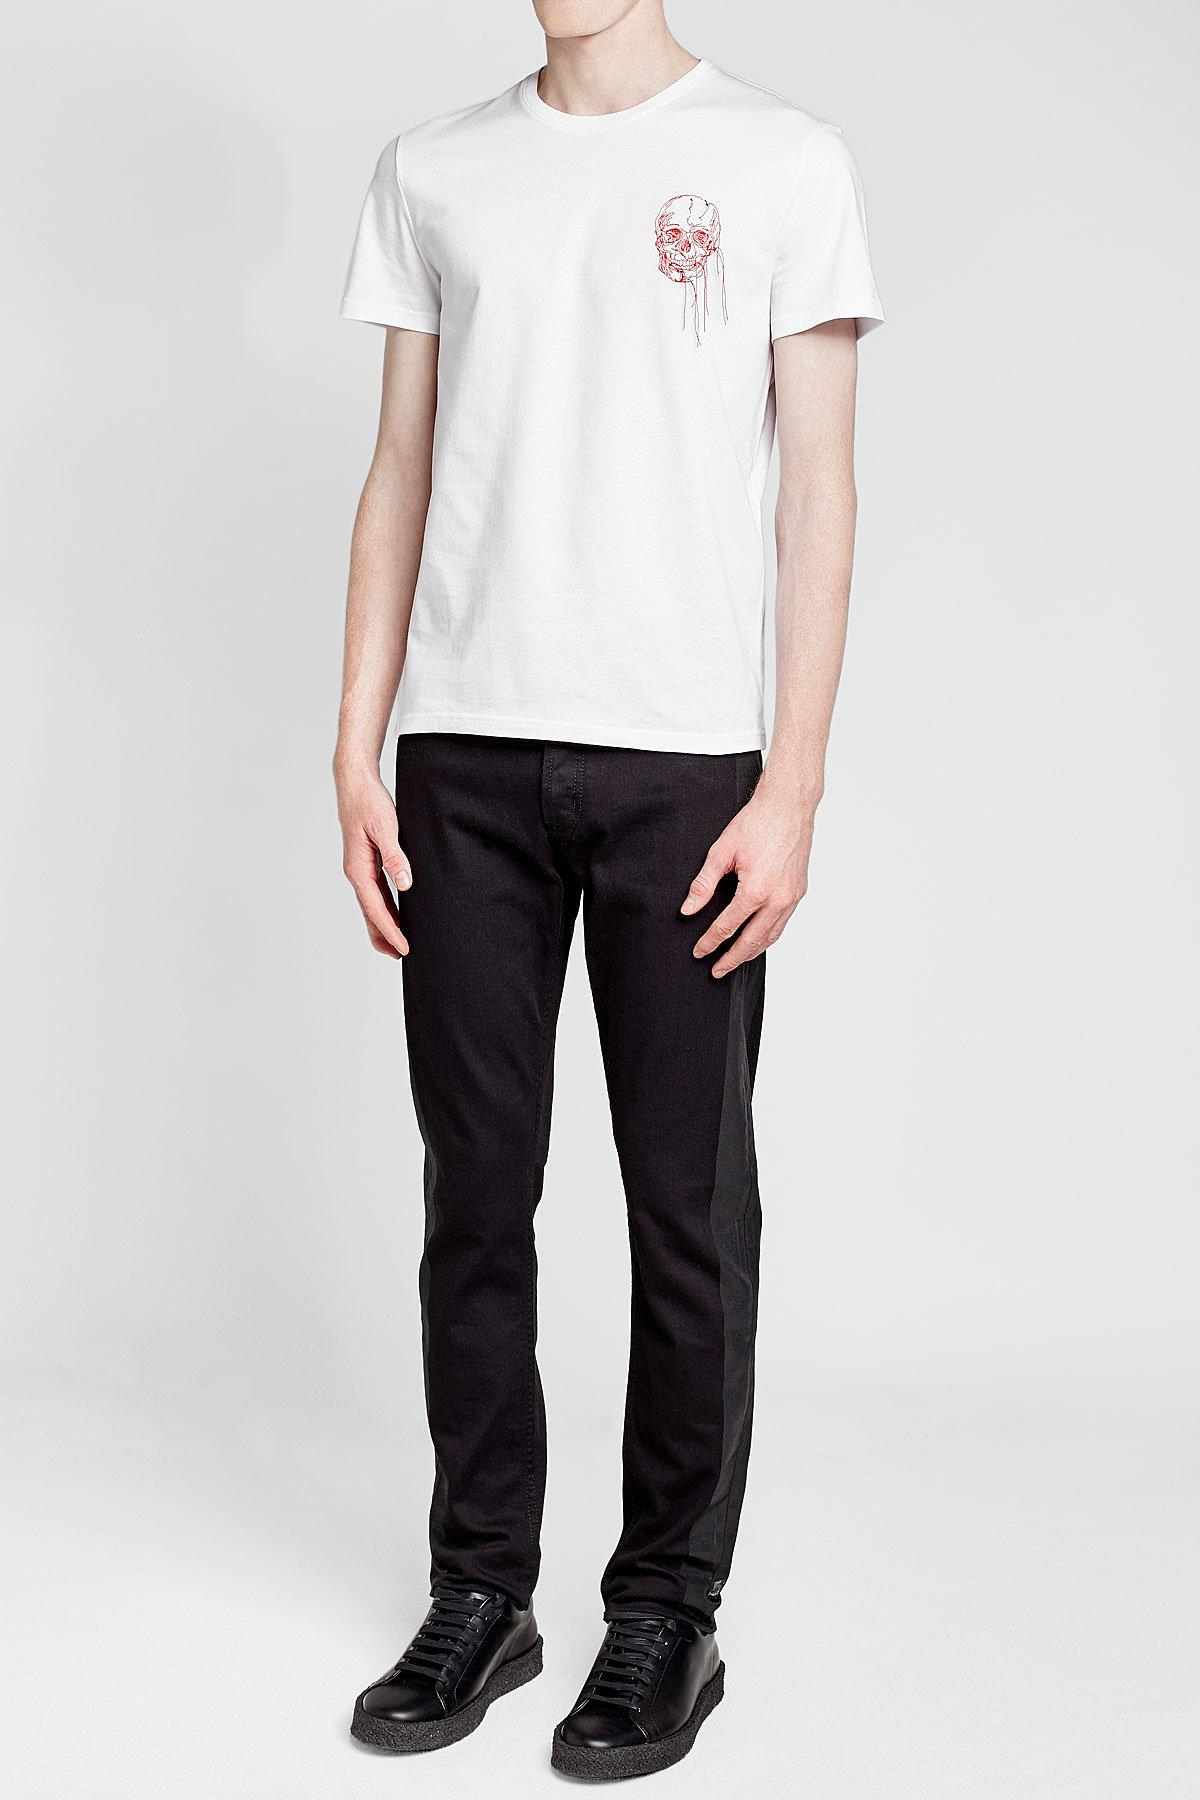 Alexander mcqueen printed cotton t shirt in white for men for Alexander mcqueen shirt men